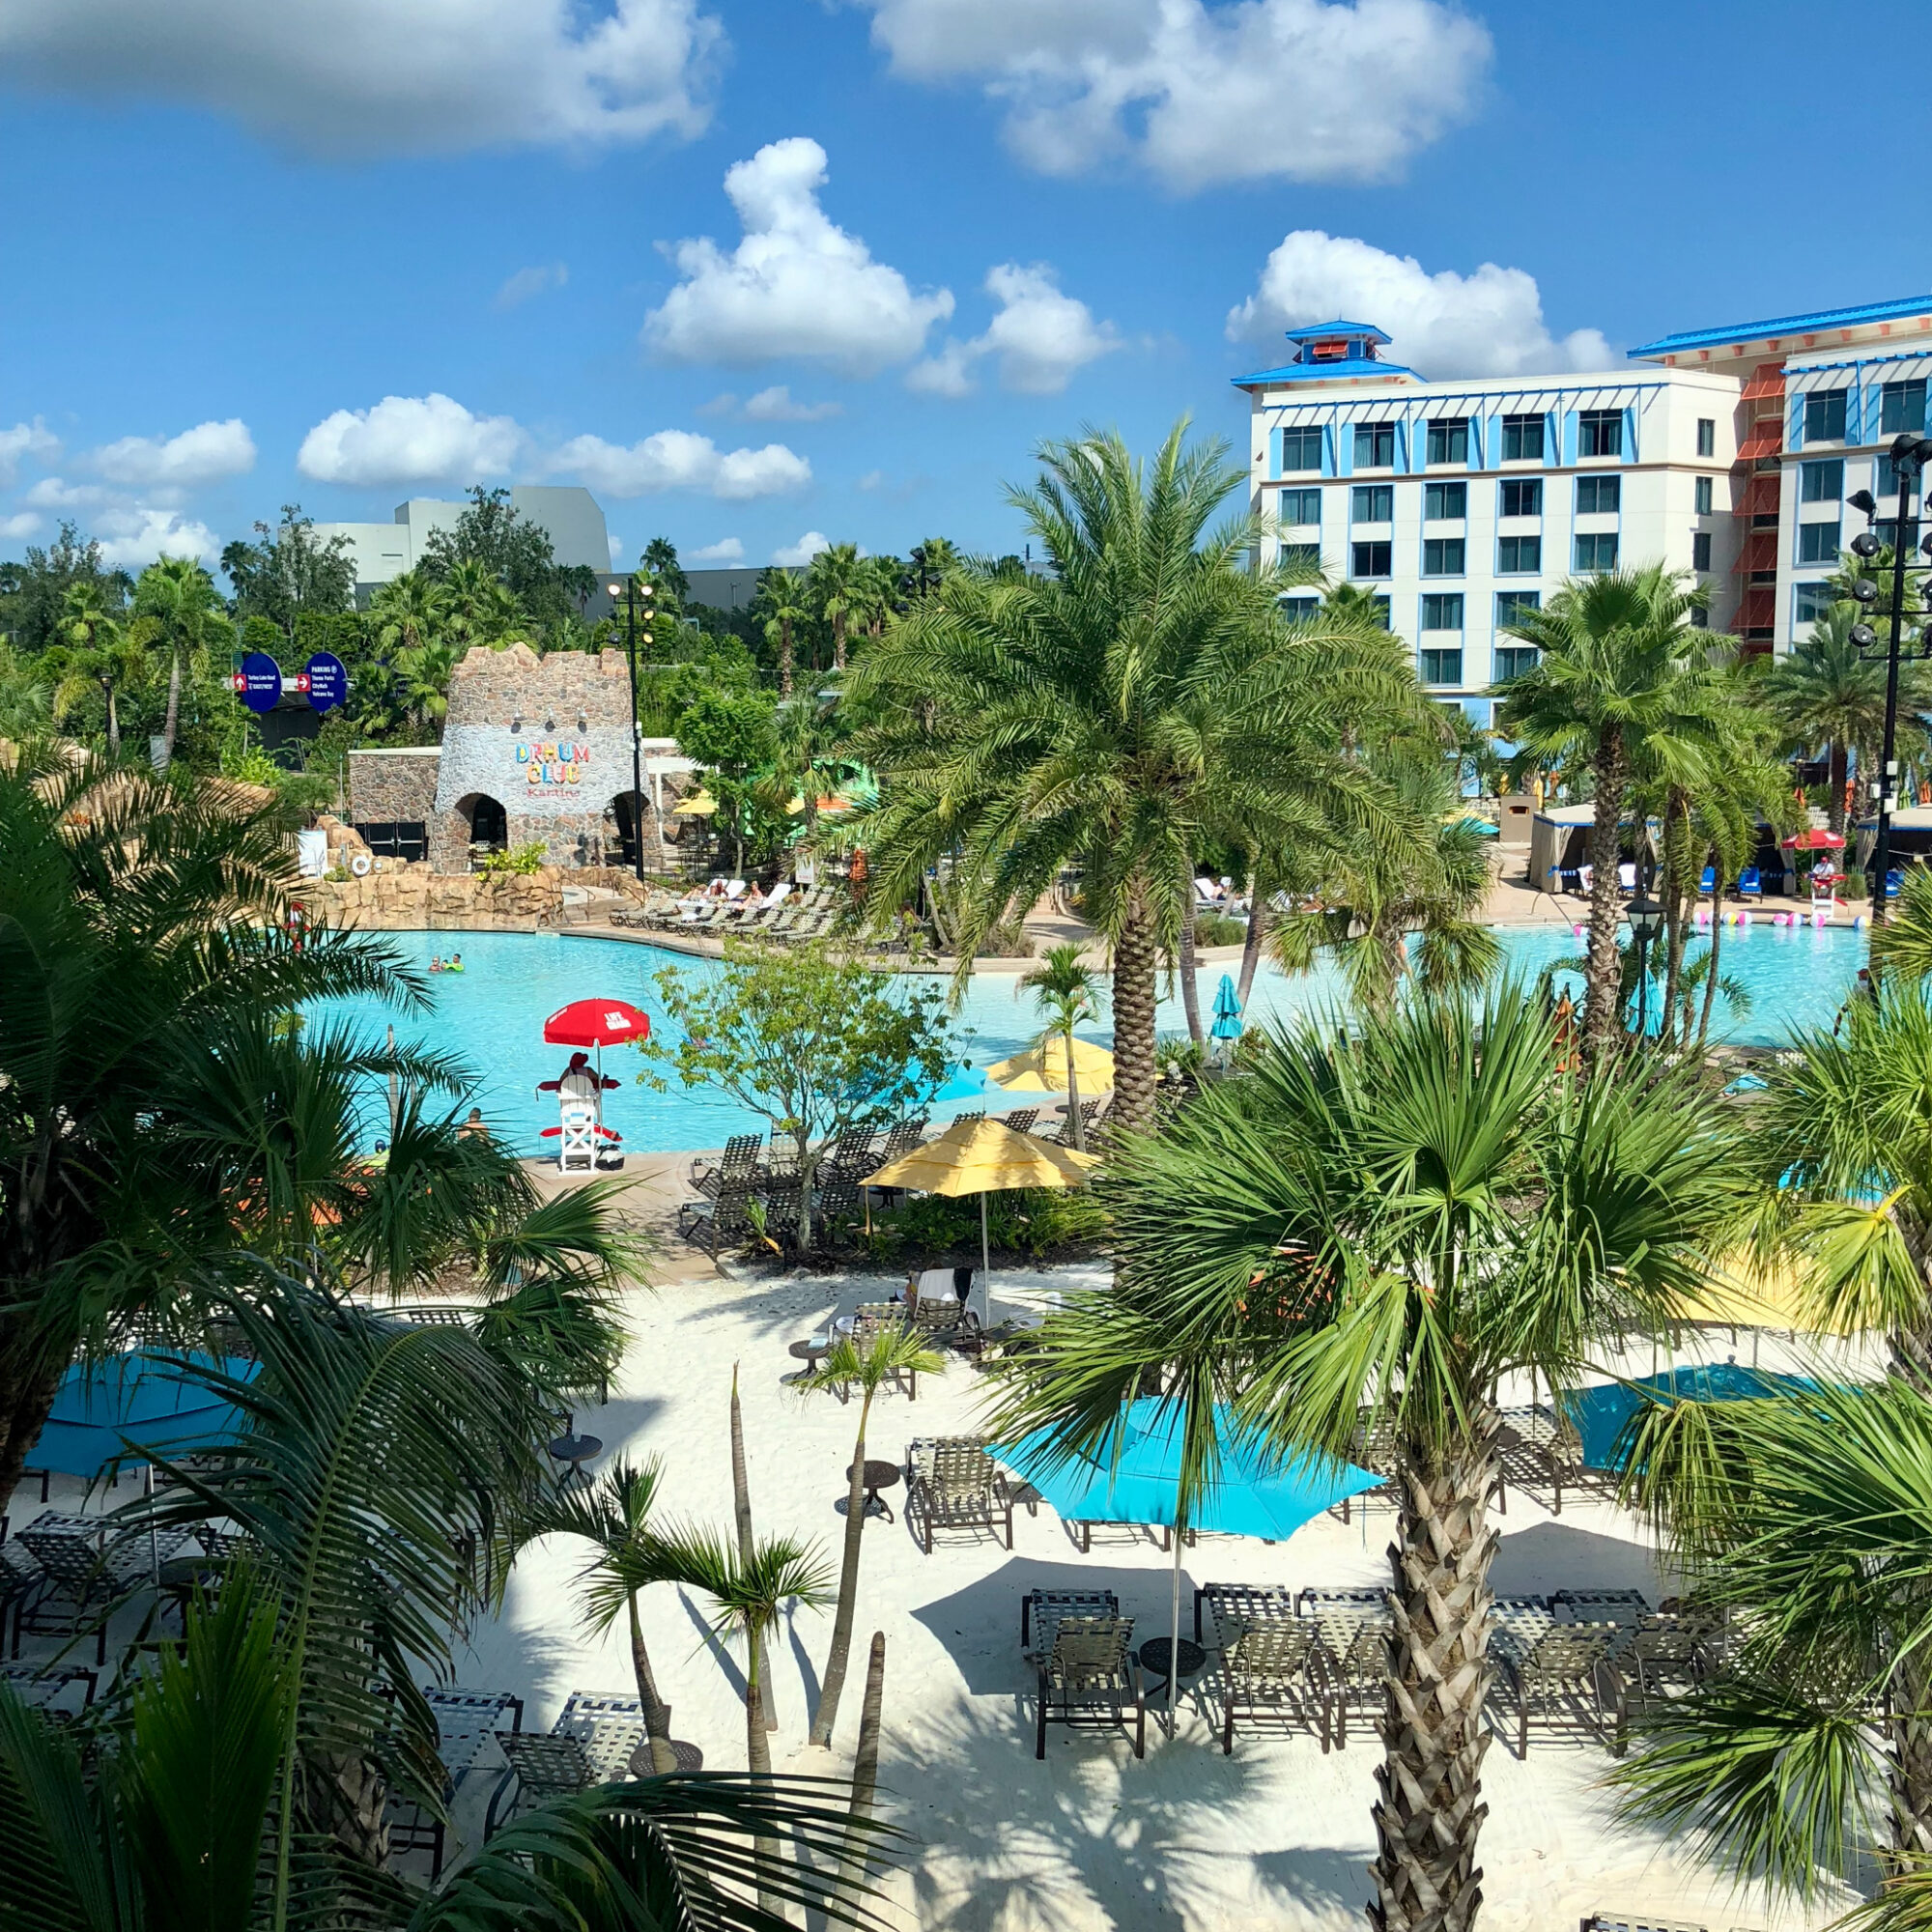 The pool at Sapphire Falls Resort.